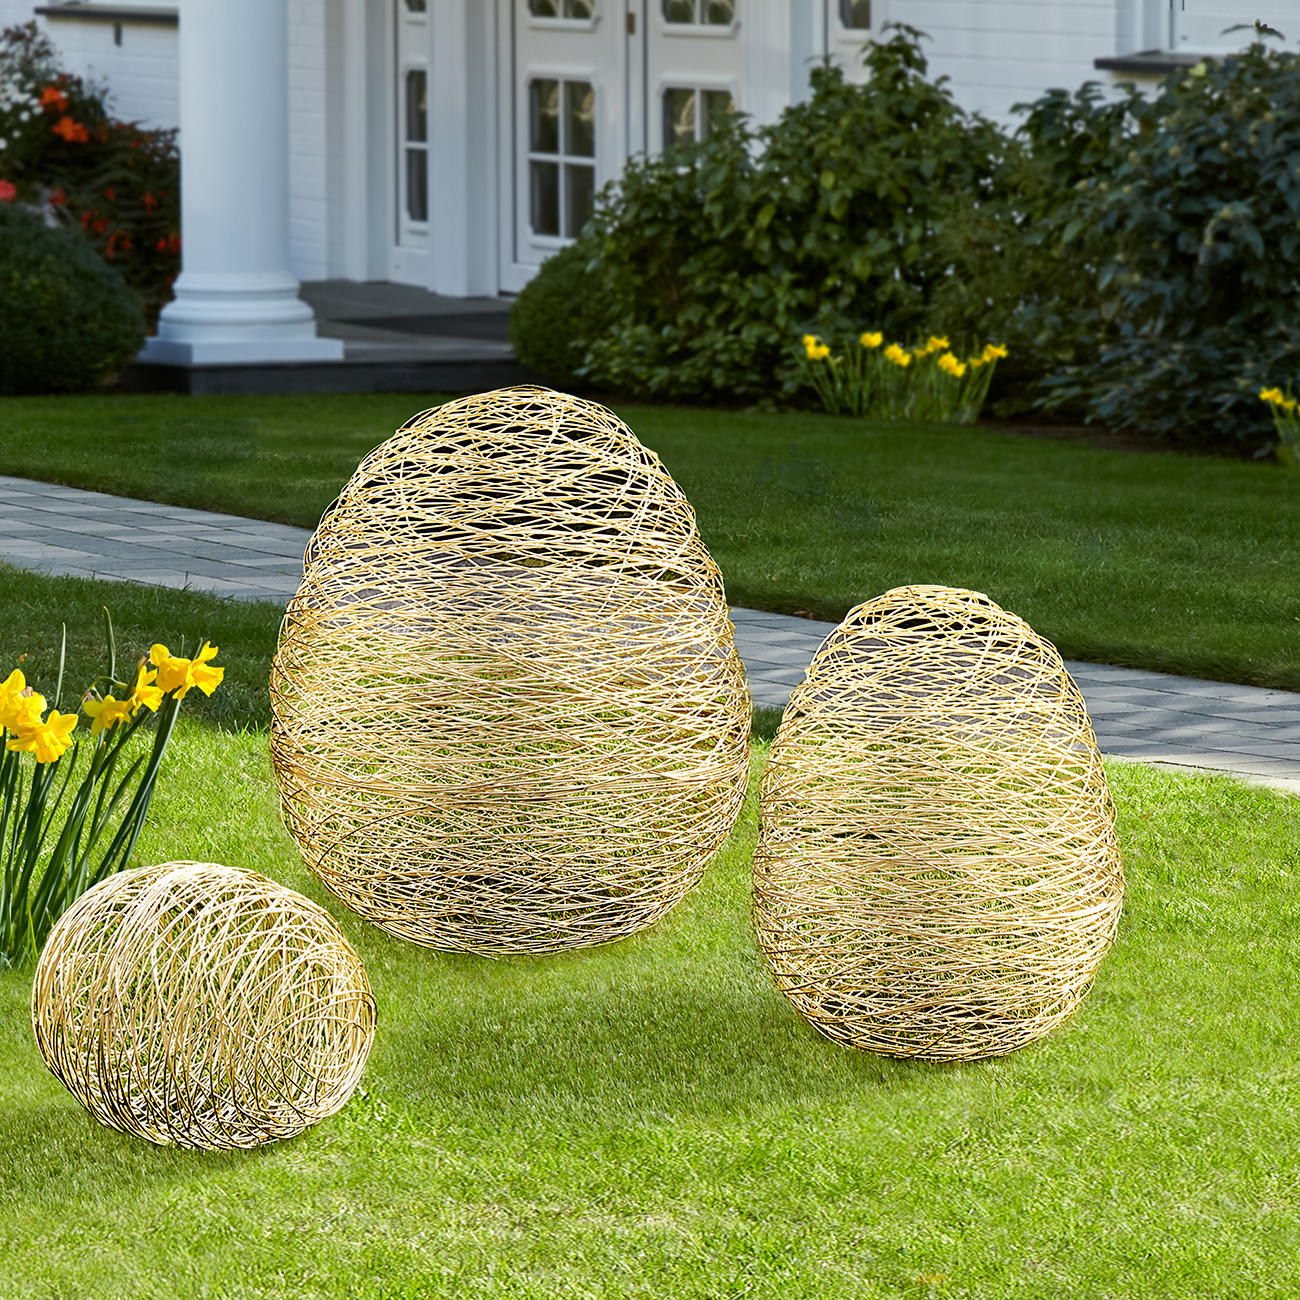 drahtgeflecht eier 3 jahre garantie pro idee. Black Bedroom Furniture Sets. Home Design Ideas